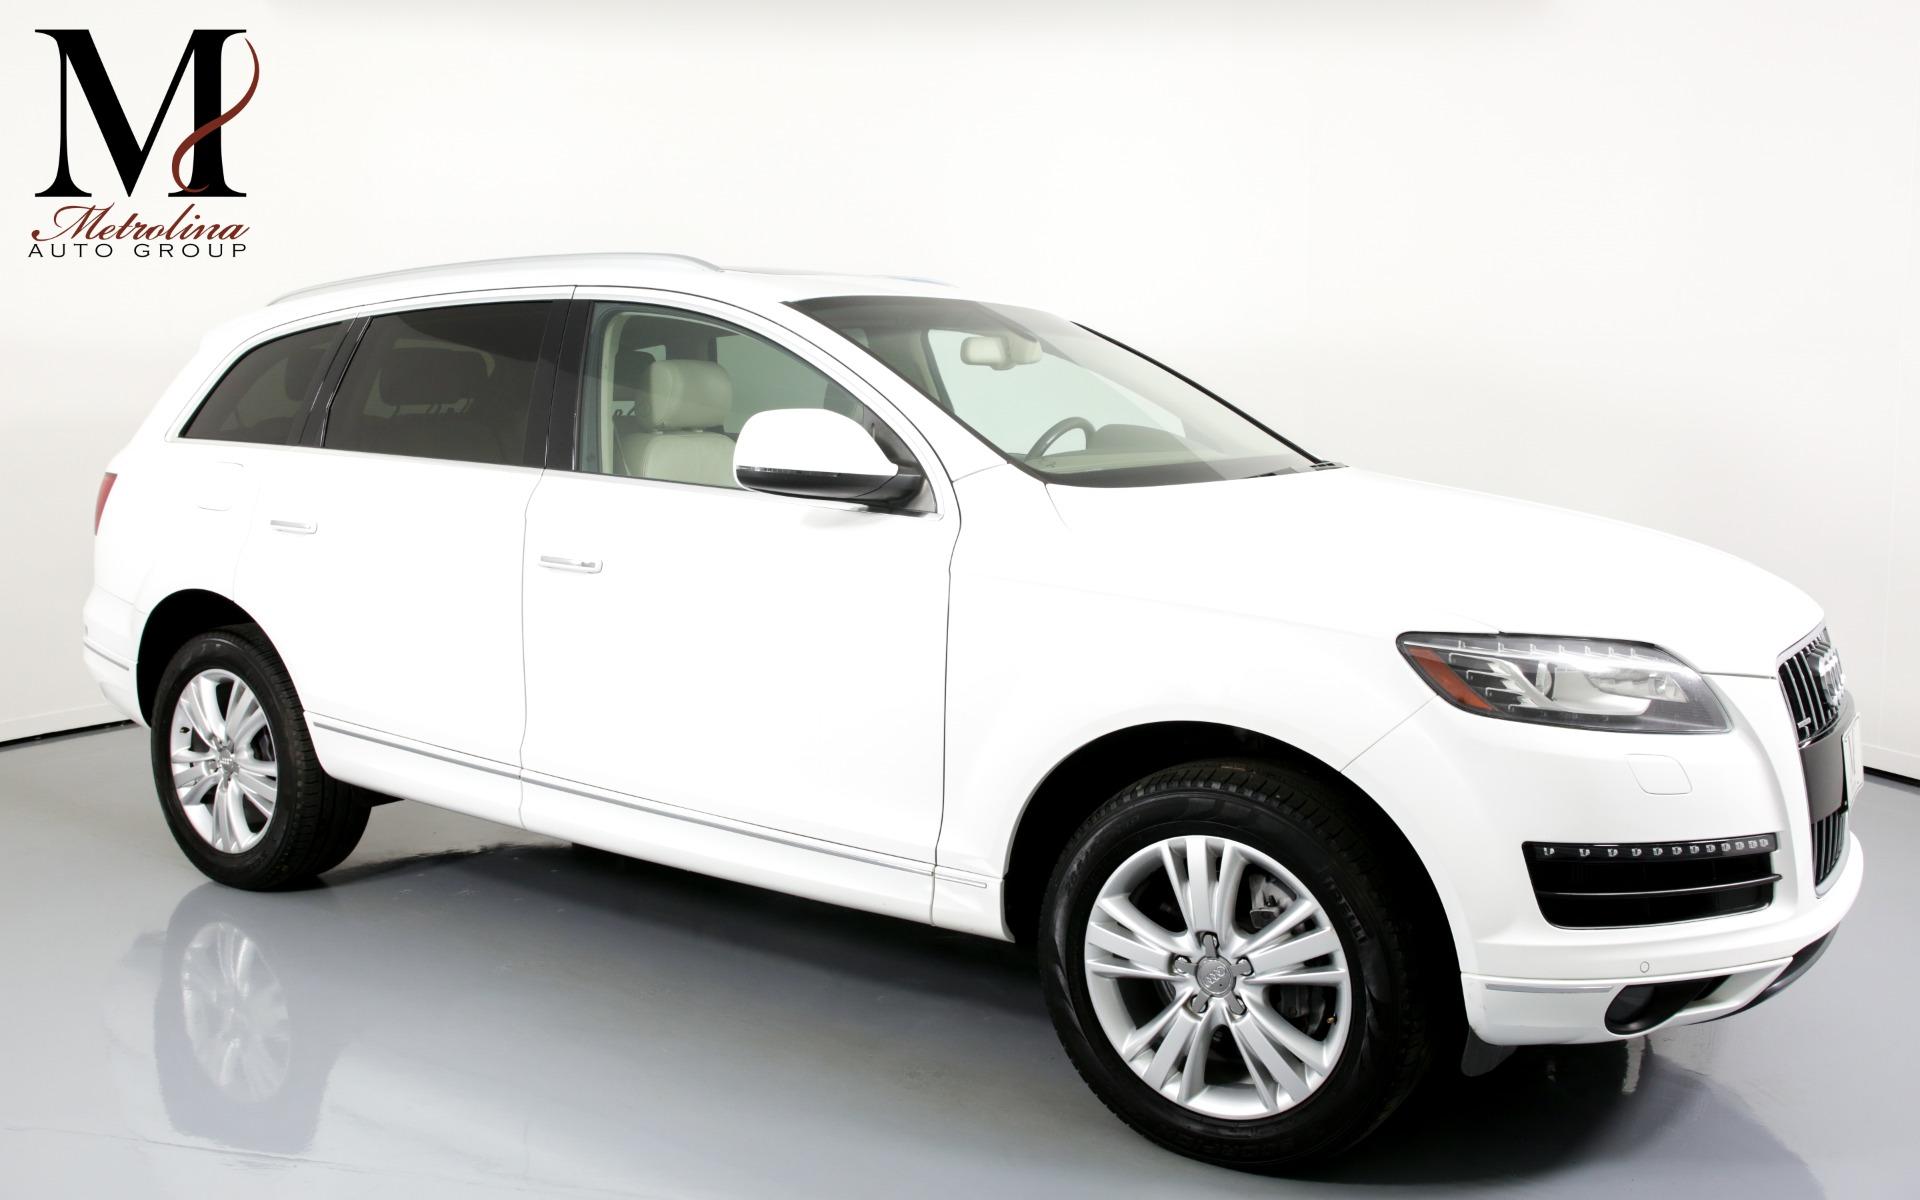 Used 2011 Audi Q7 3.0 quattro TDI Premium Plus AWD 4dr SUV for sale $16,456 at Metrolina Auto Group in Charlotte NC 28217 - 1